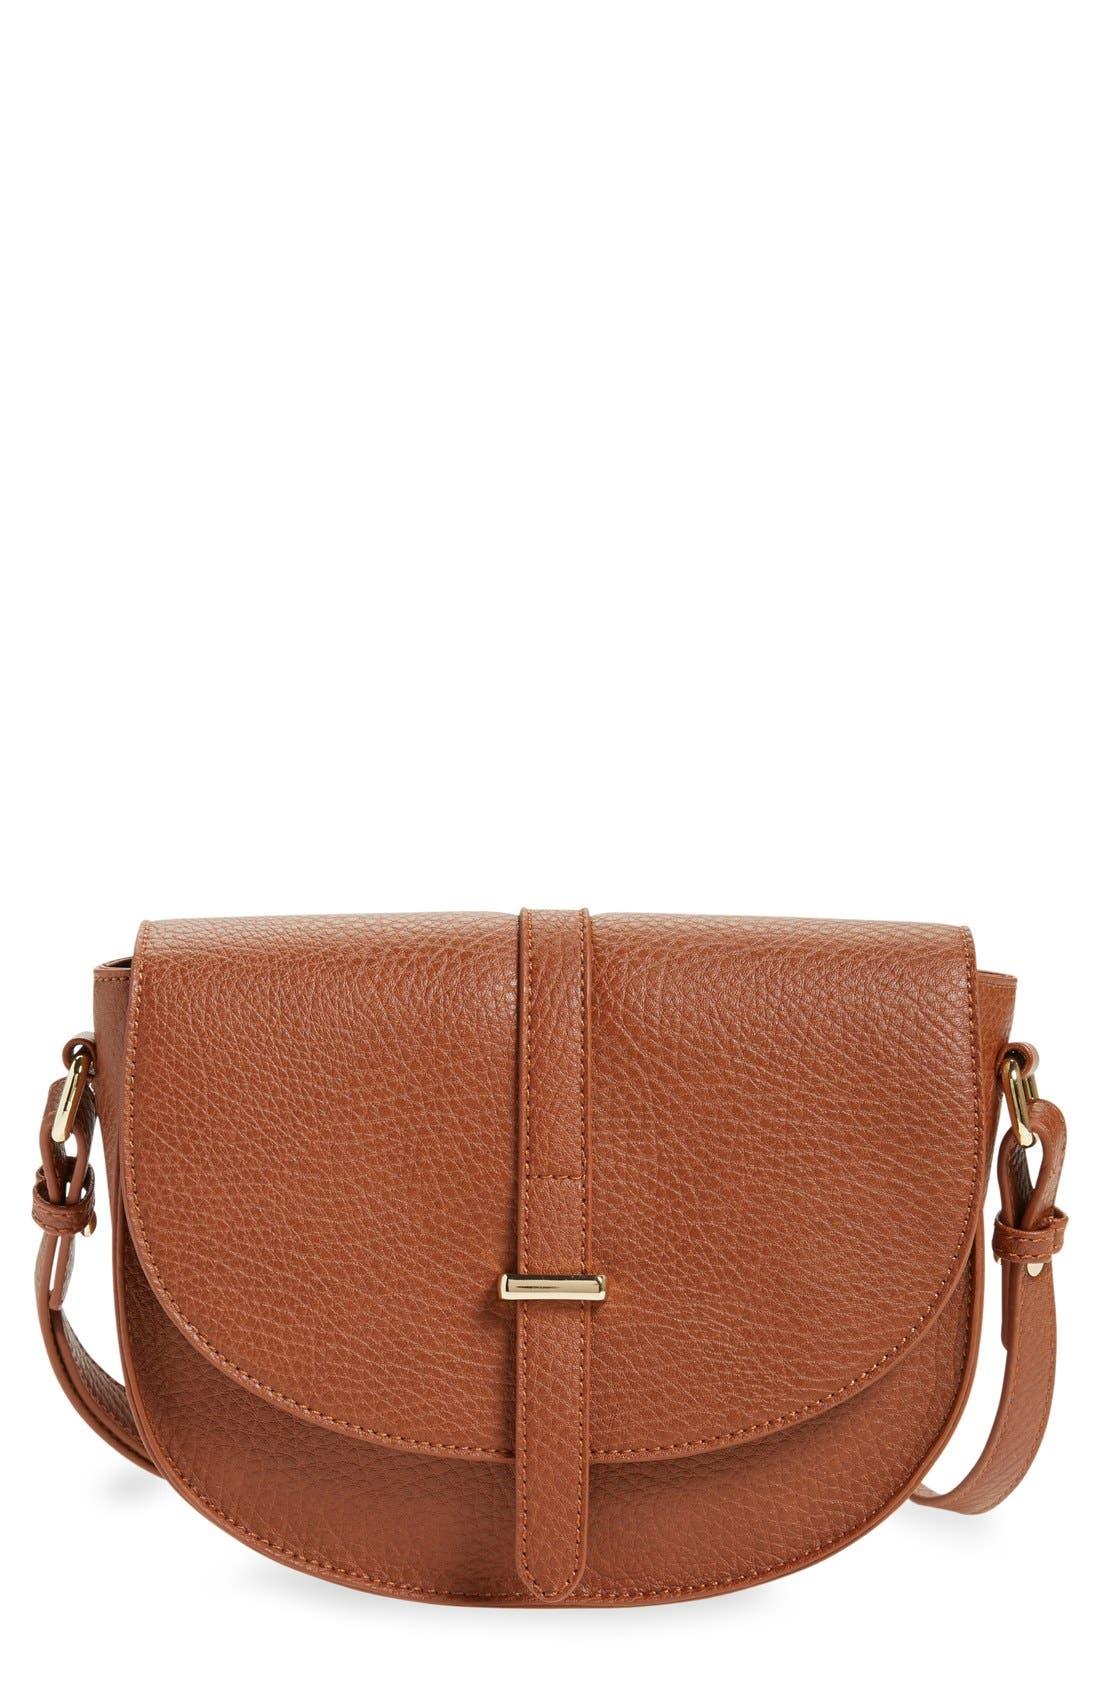 Alternate Image 1 Selected - BP. Faux Leather Saddle Crossbody Bag